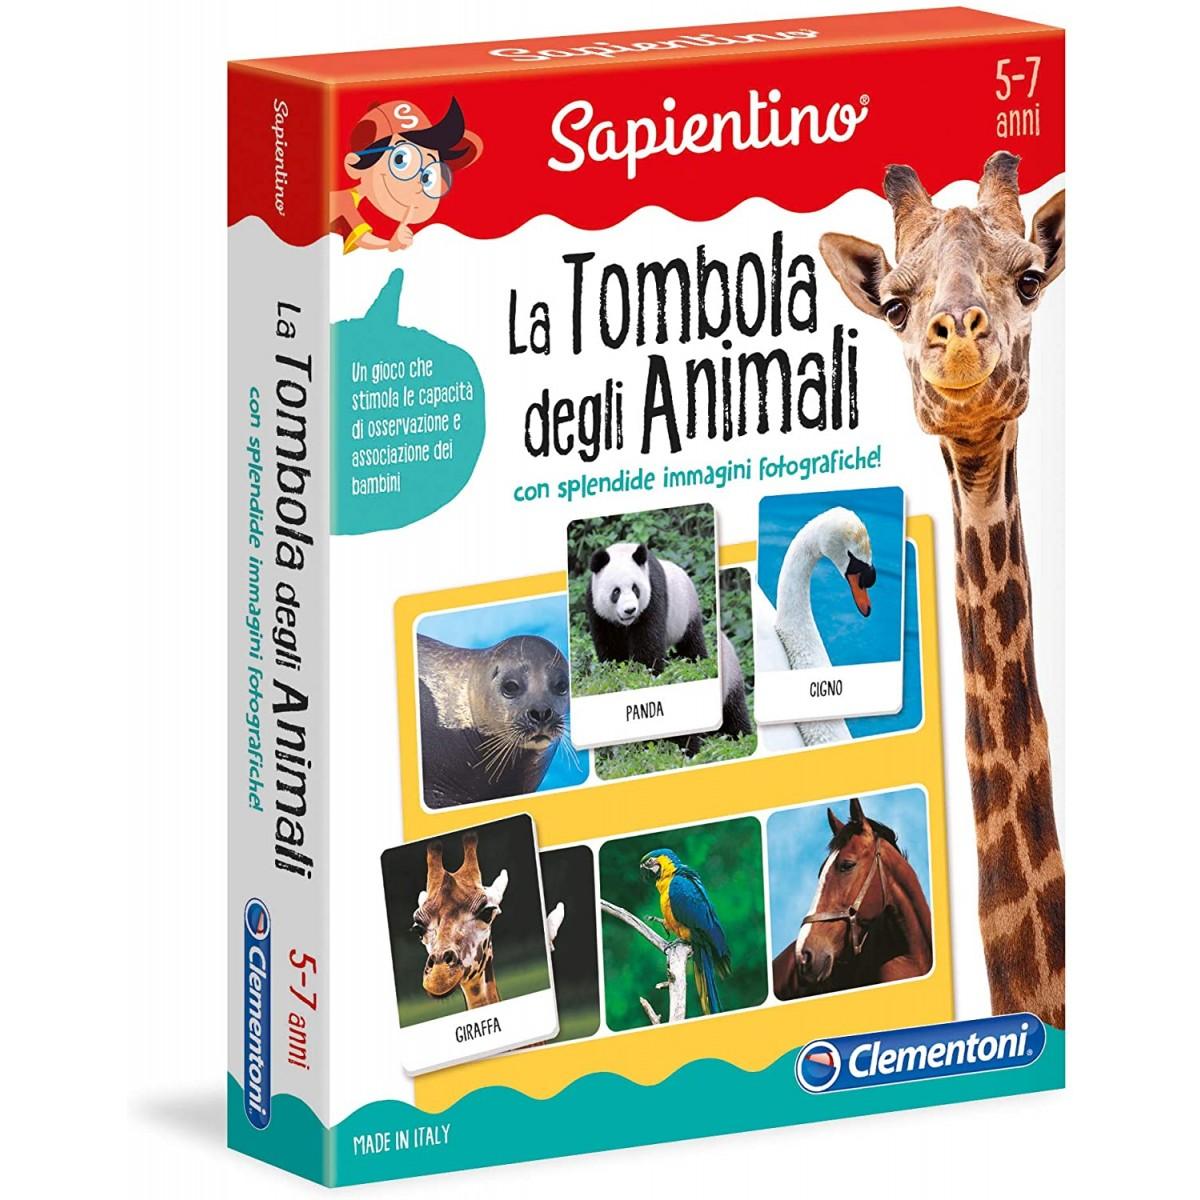 La Tombola degli Animali - Clementoni, per bambini